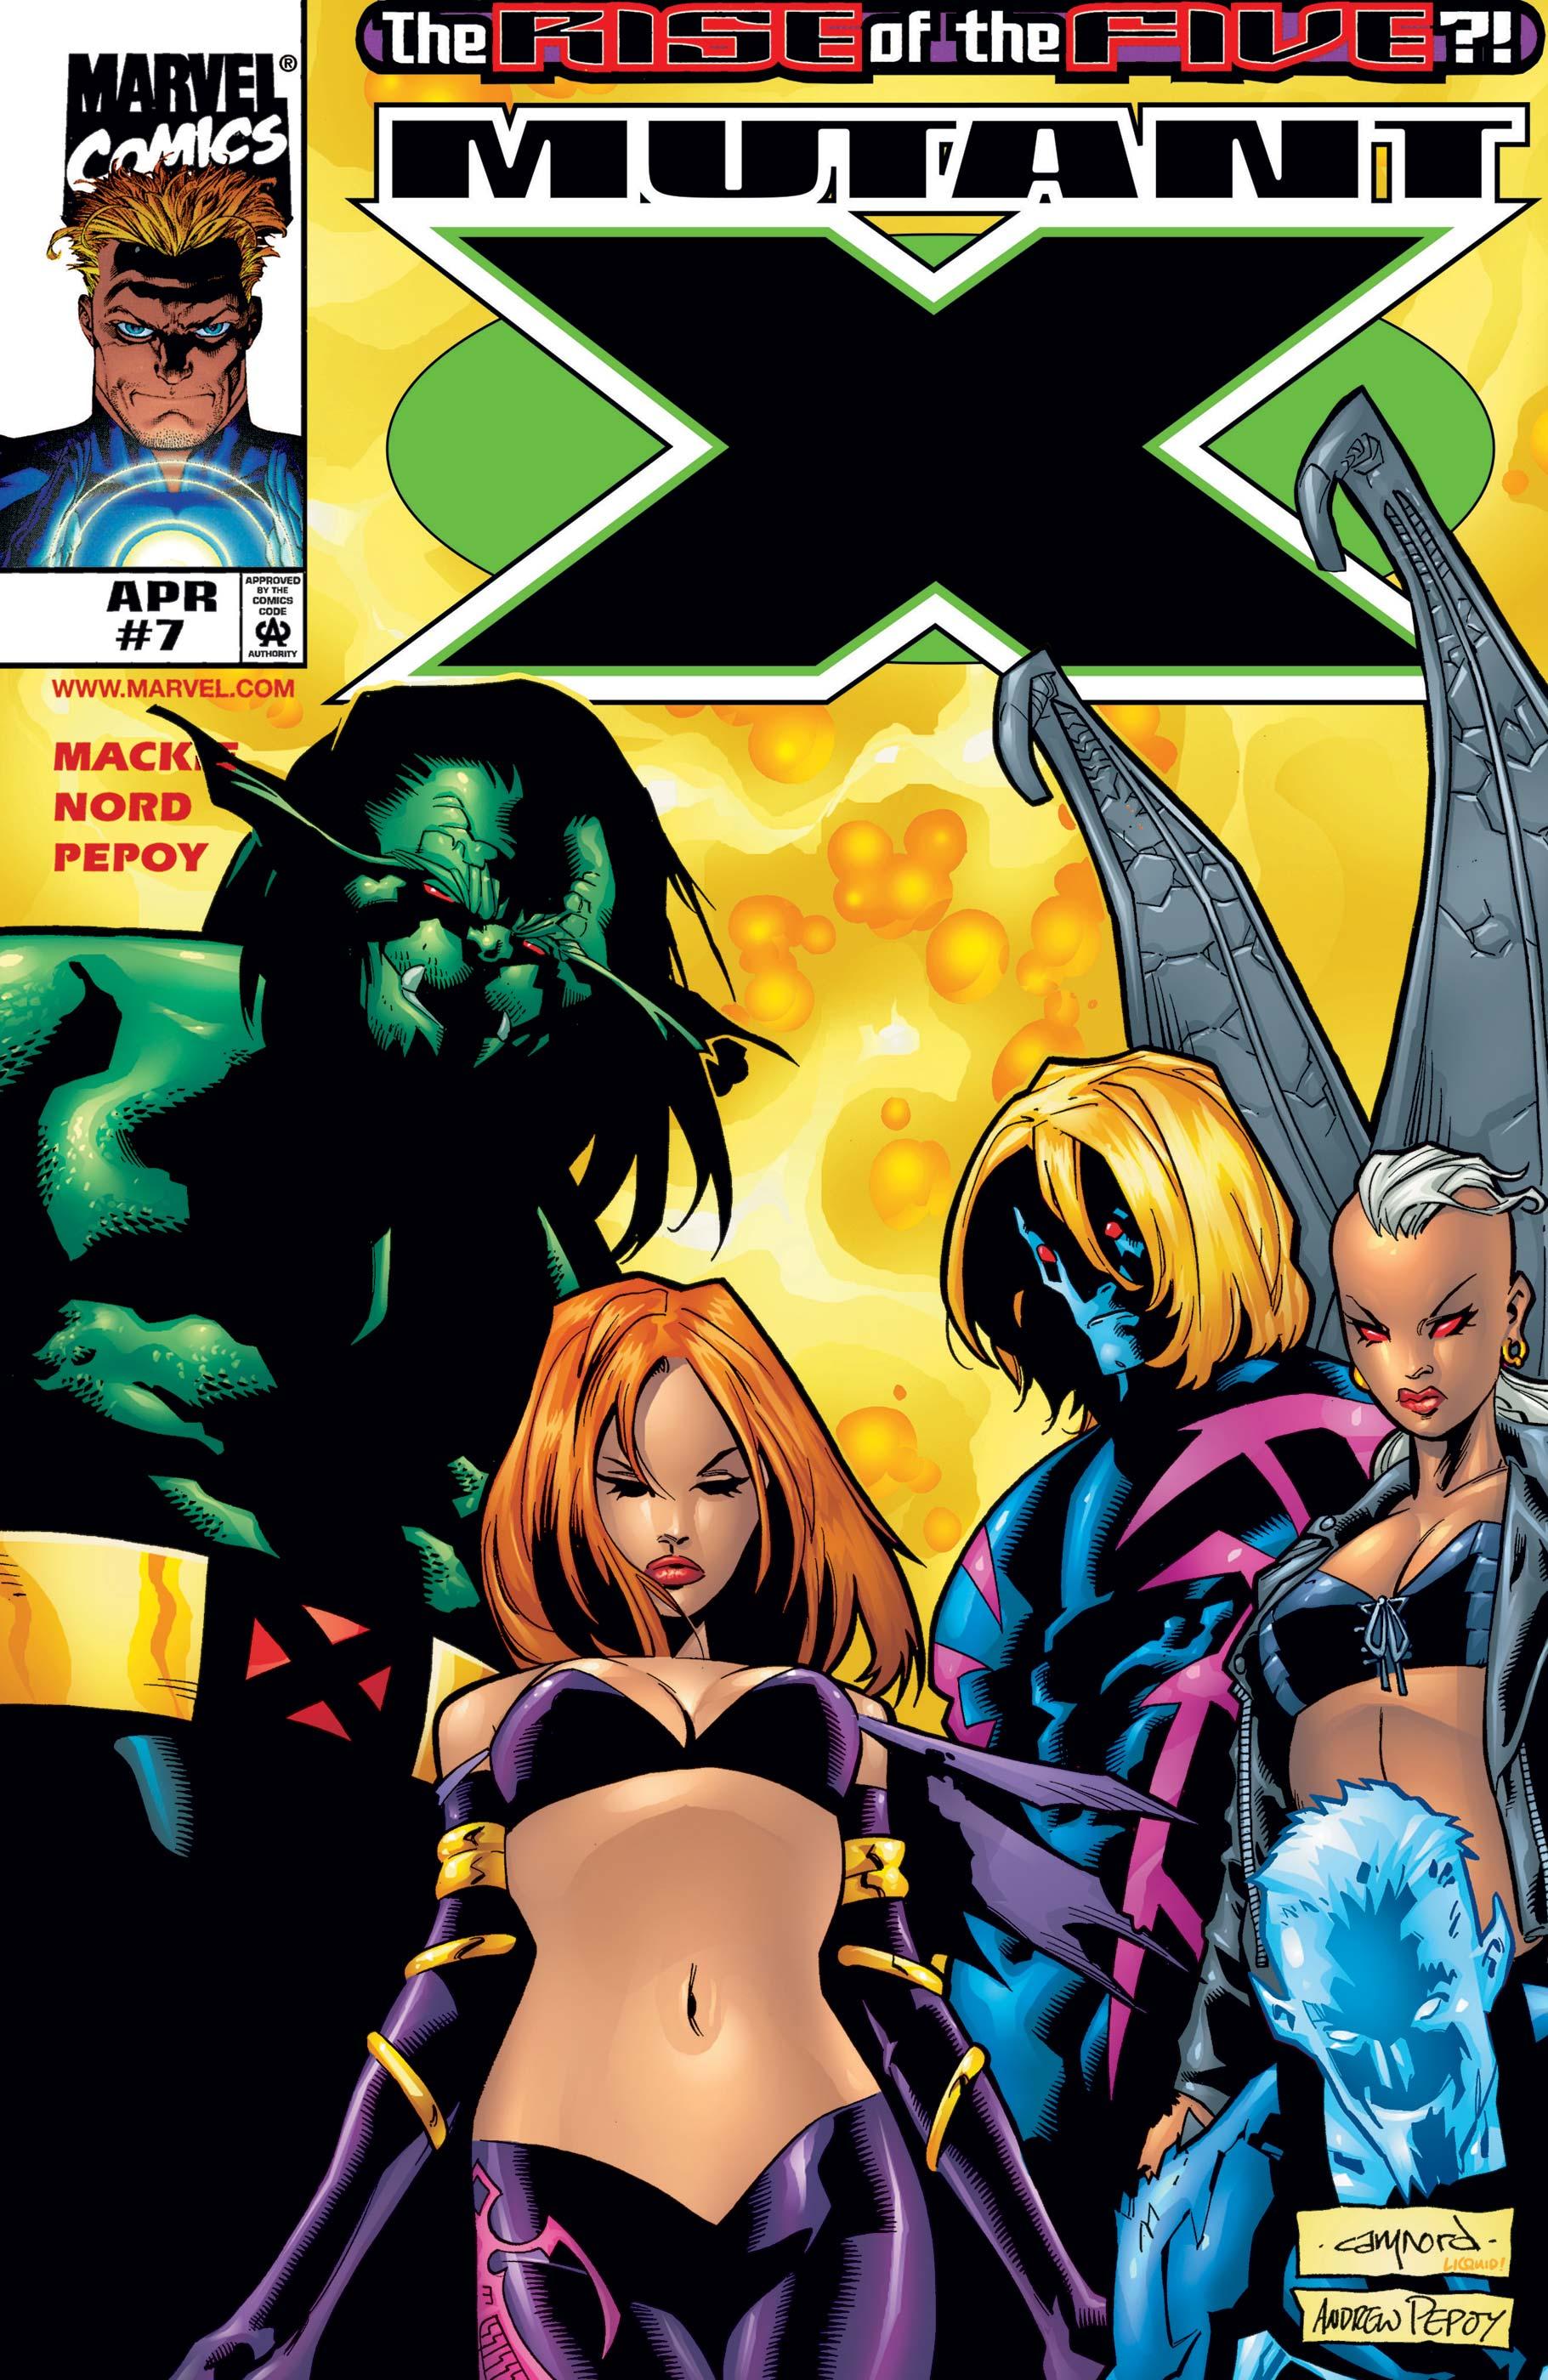 Mutant X (1998) #7